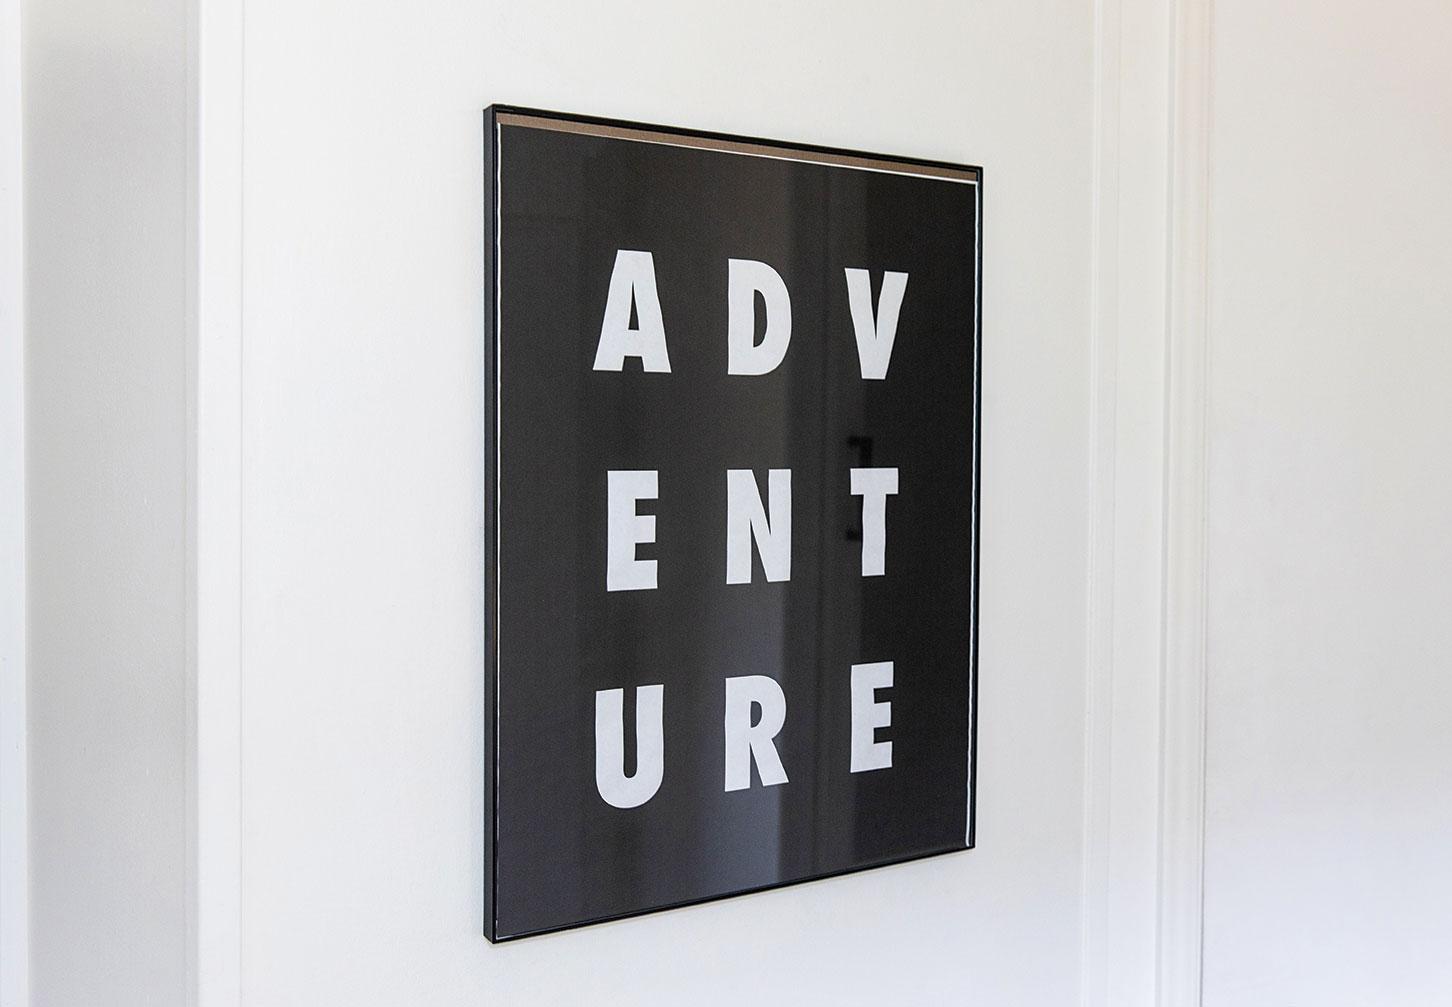 walker campers san diego rental renovation trailers RV adventure art decor